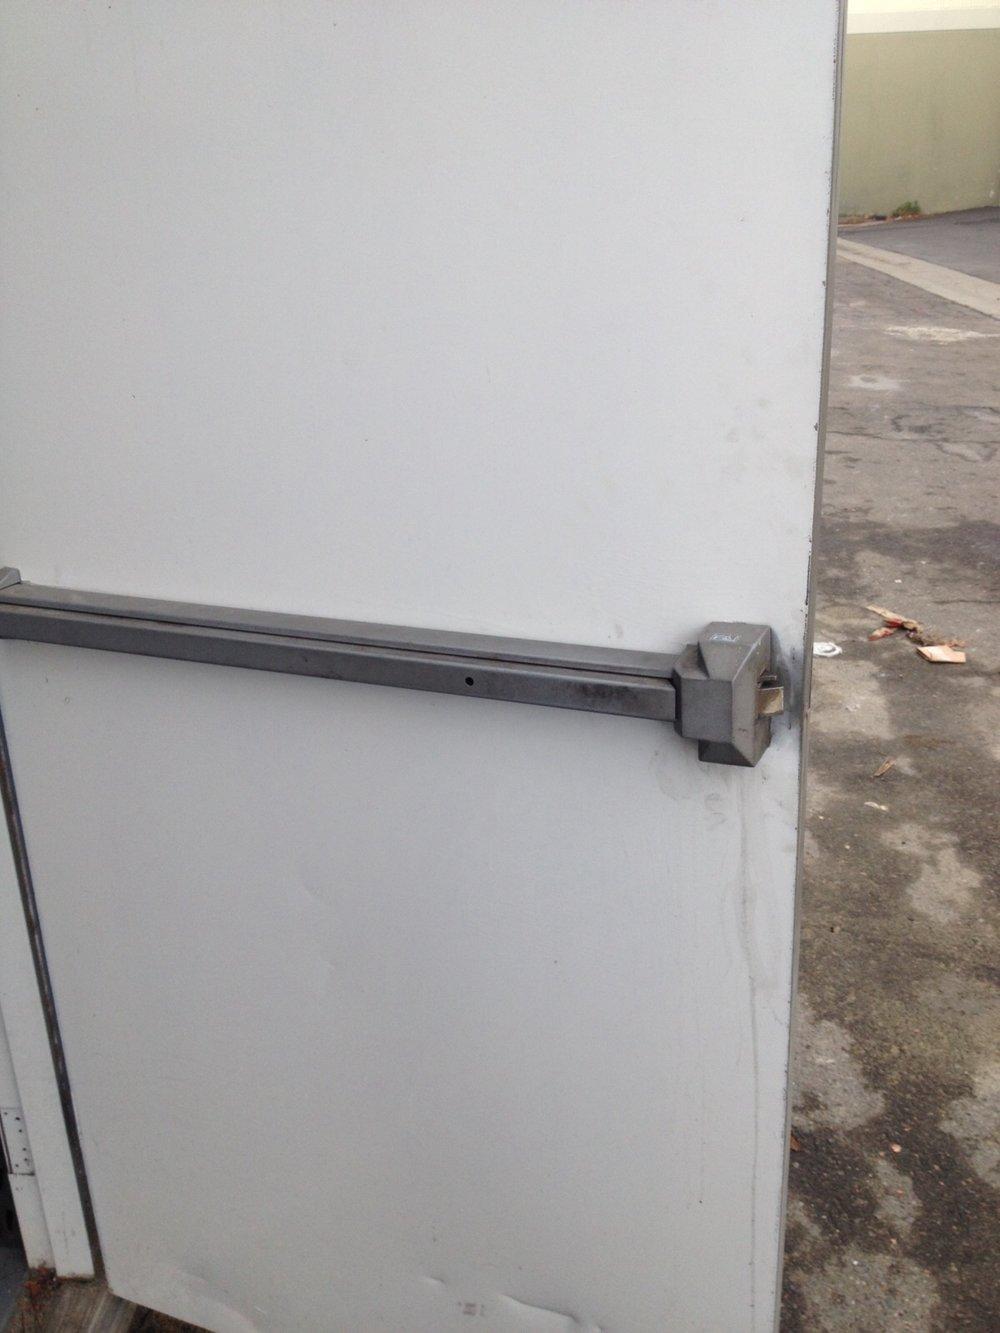 Push bar stuck in the unlocked position.